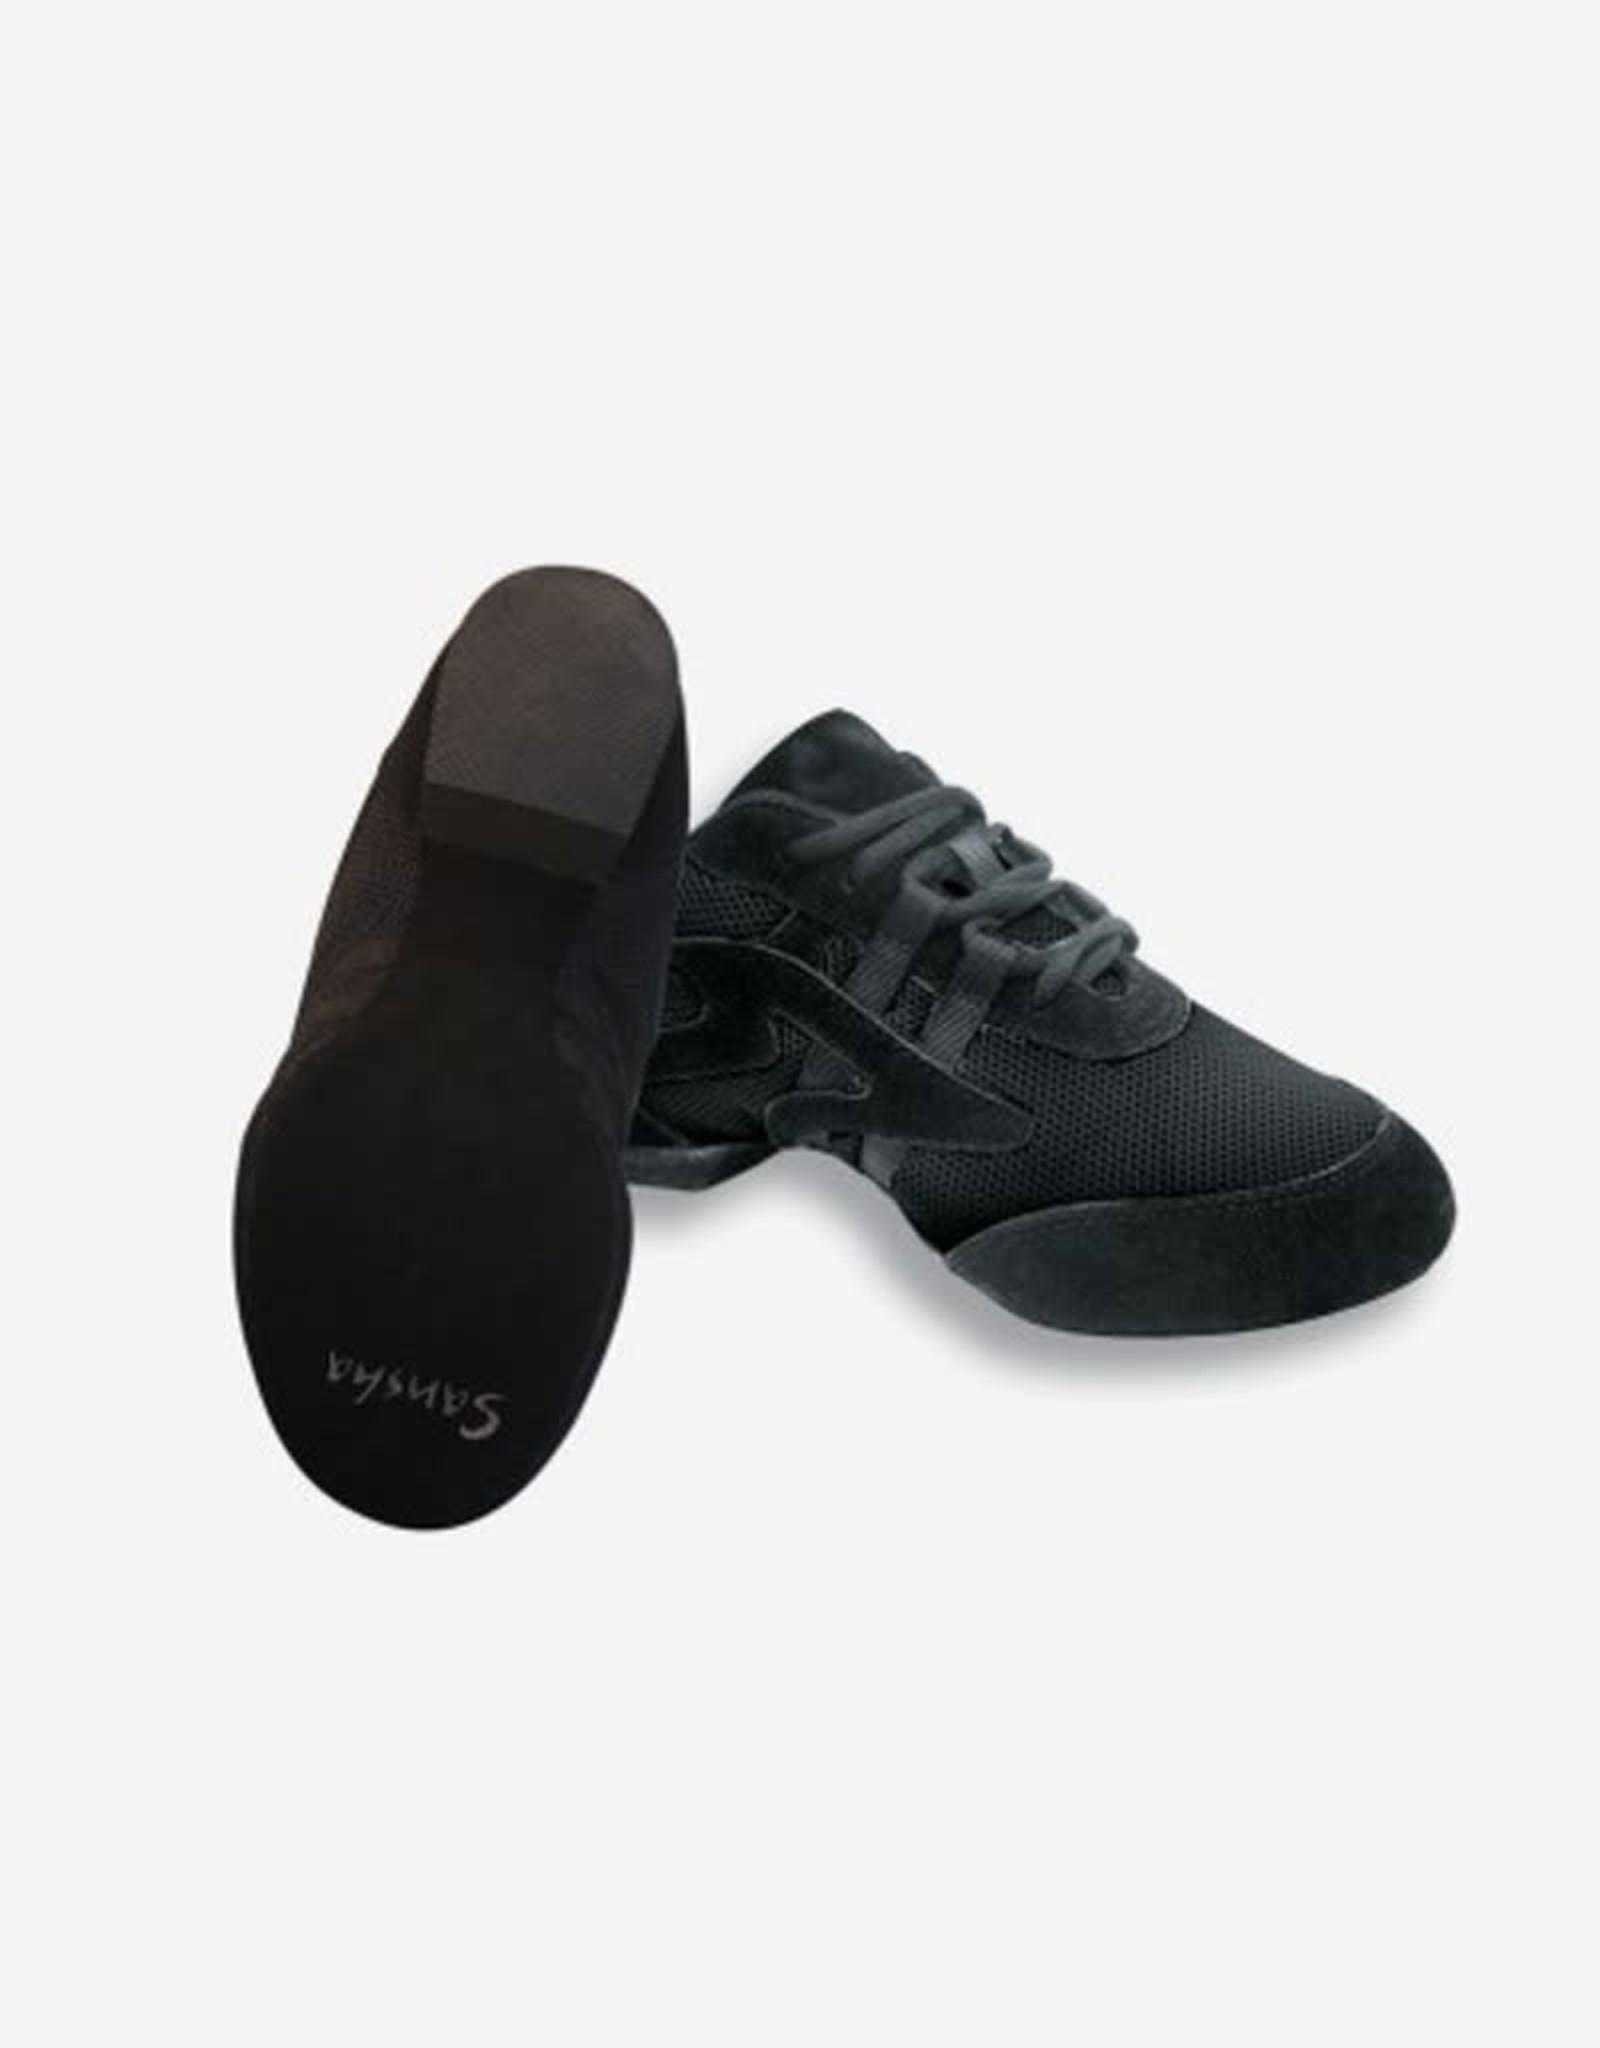 Sansha Salsette Sports Shoes V931M